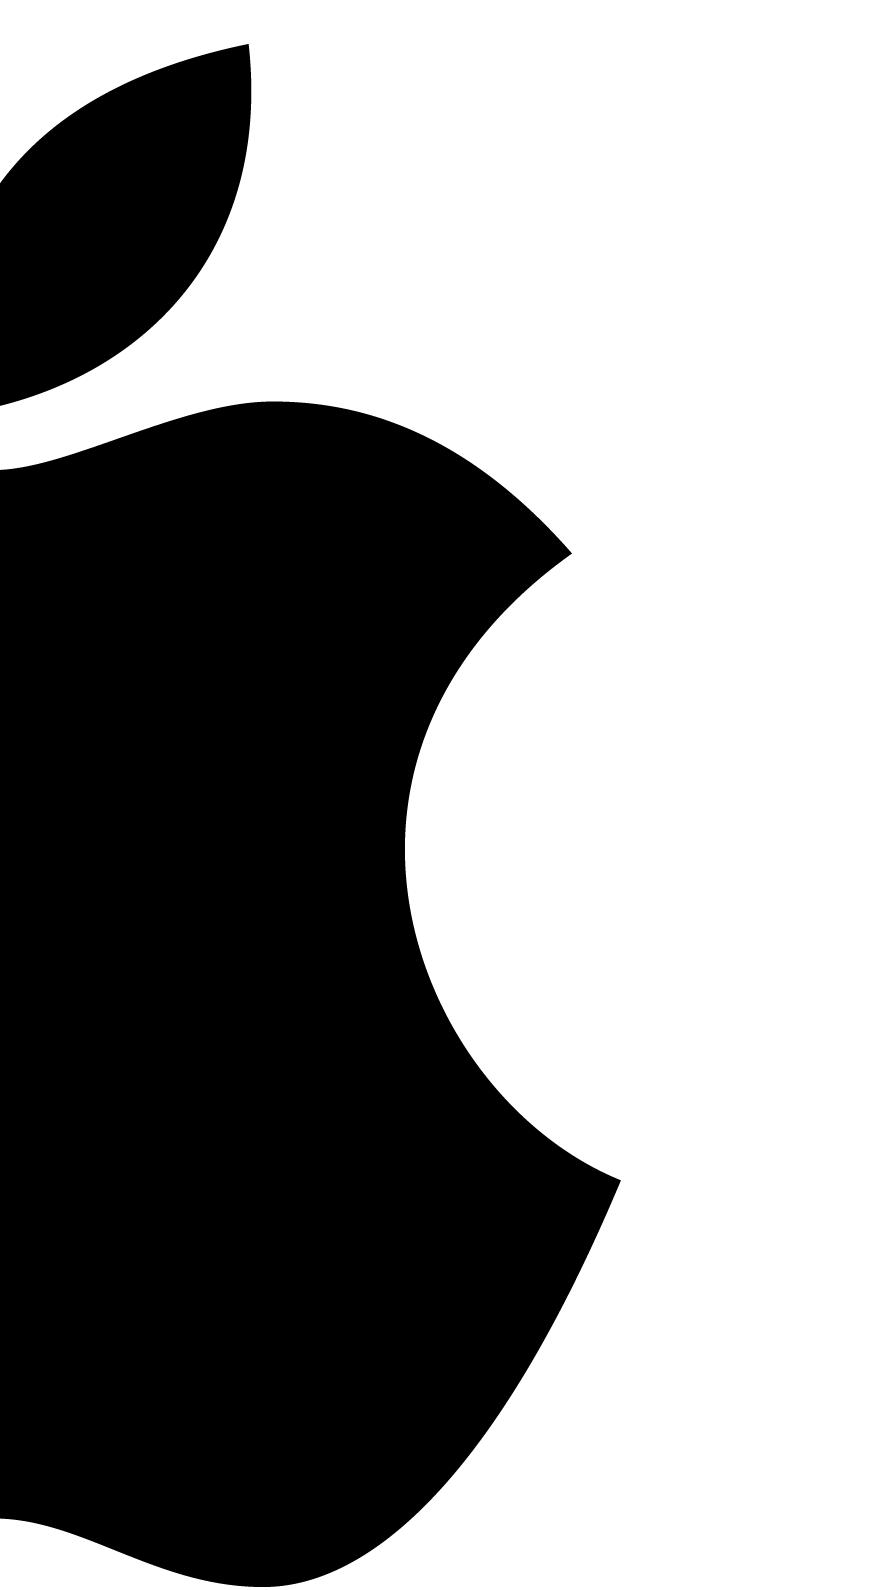 iPhone7, 6, 5用壁紙 Appleロゴ モノクロ 4